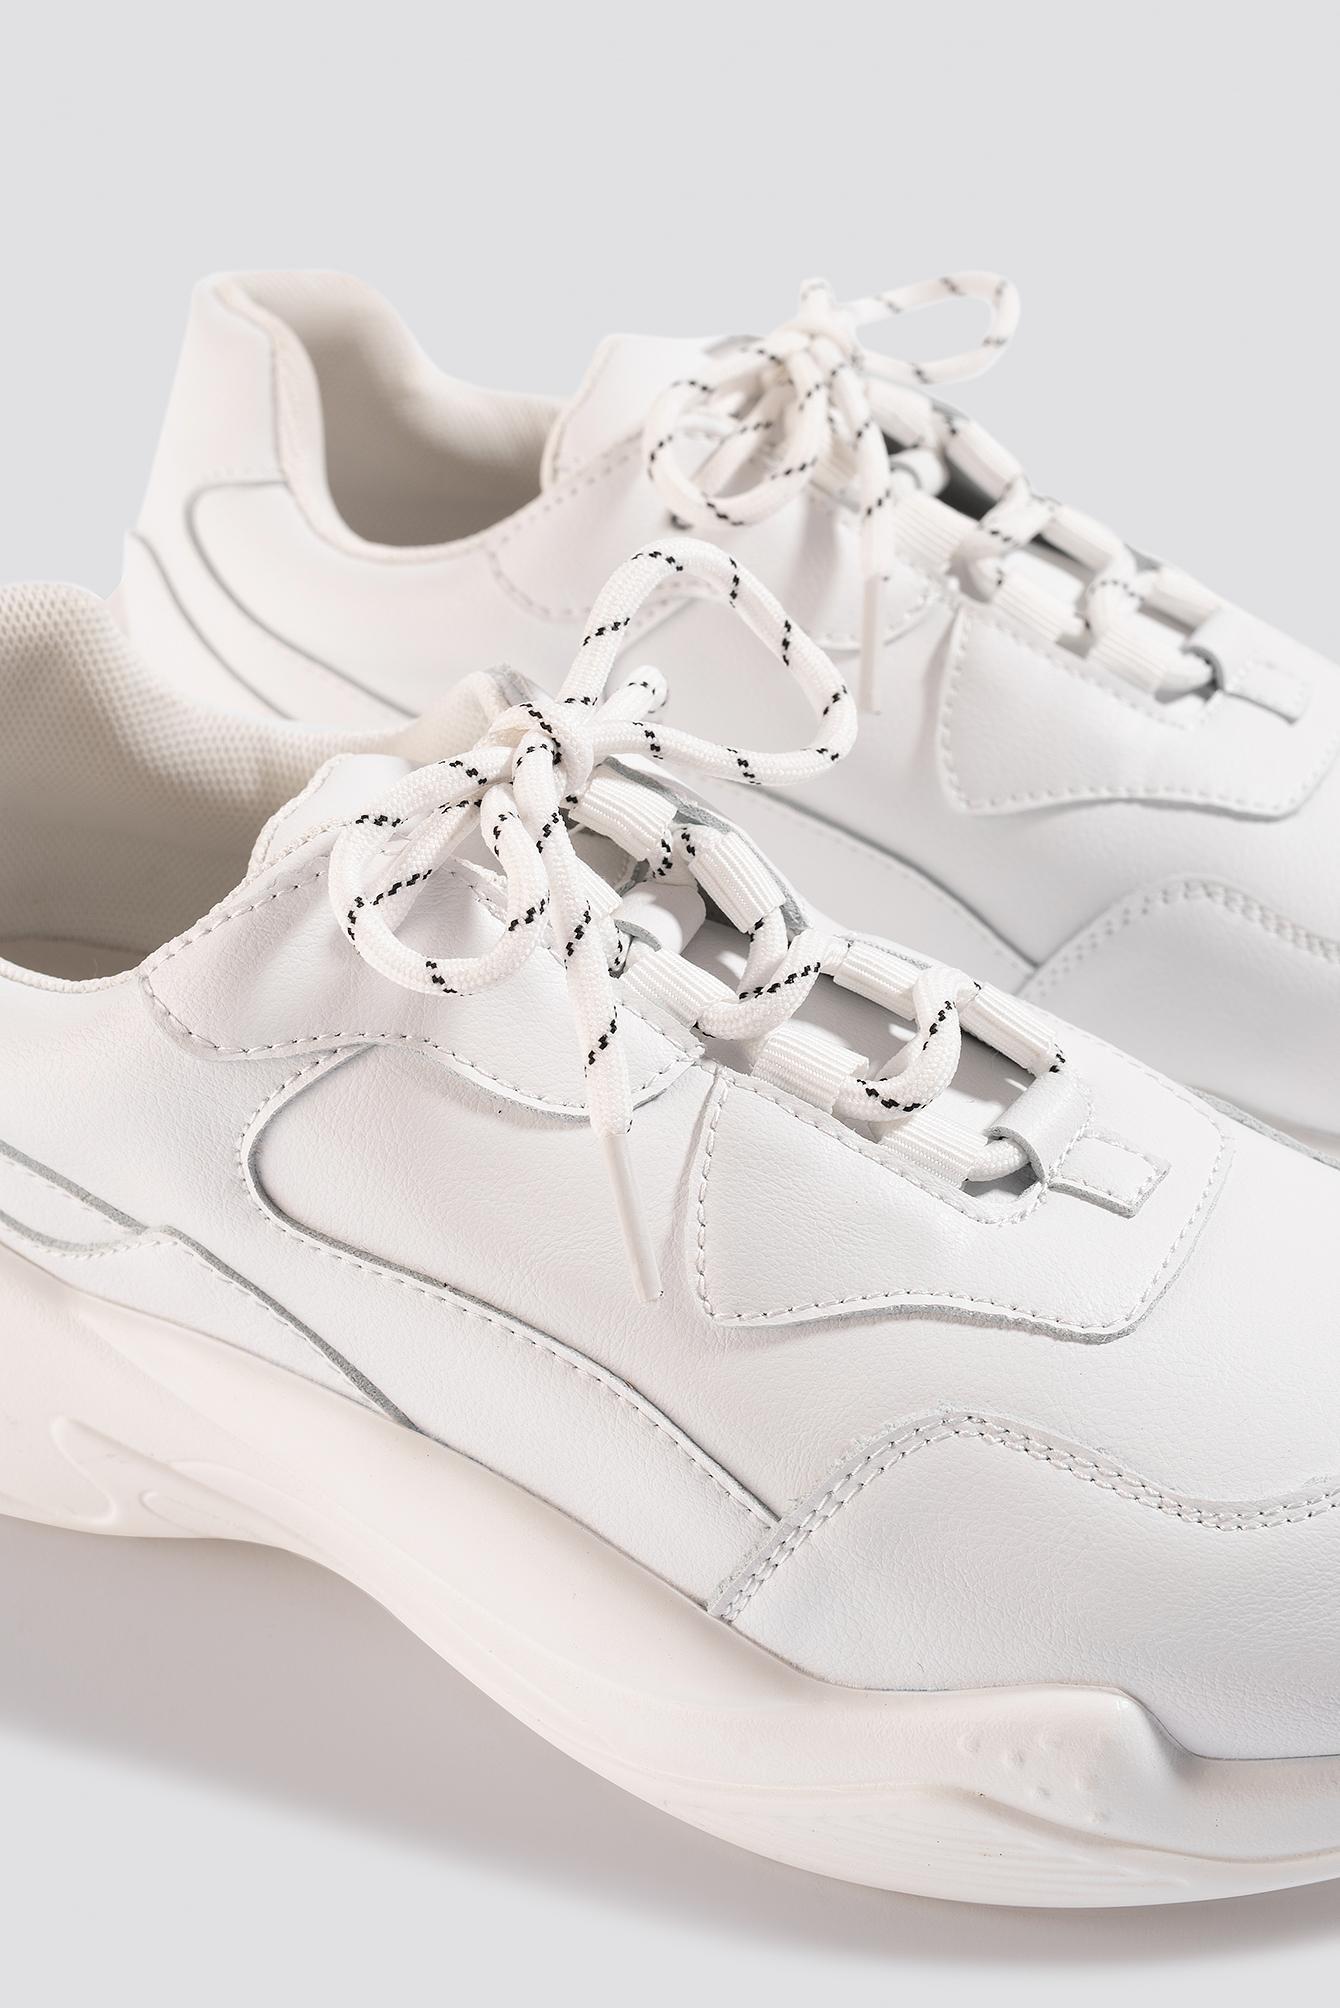 Low Striped Lace Trainers NA-KD en coloris Blanc